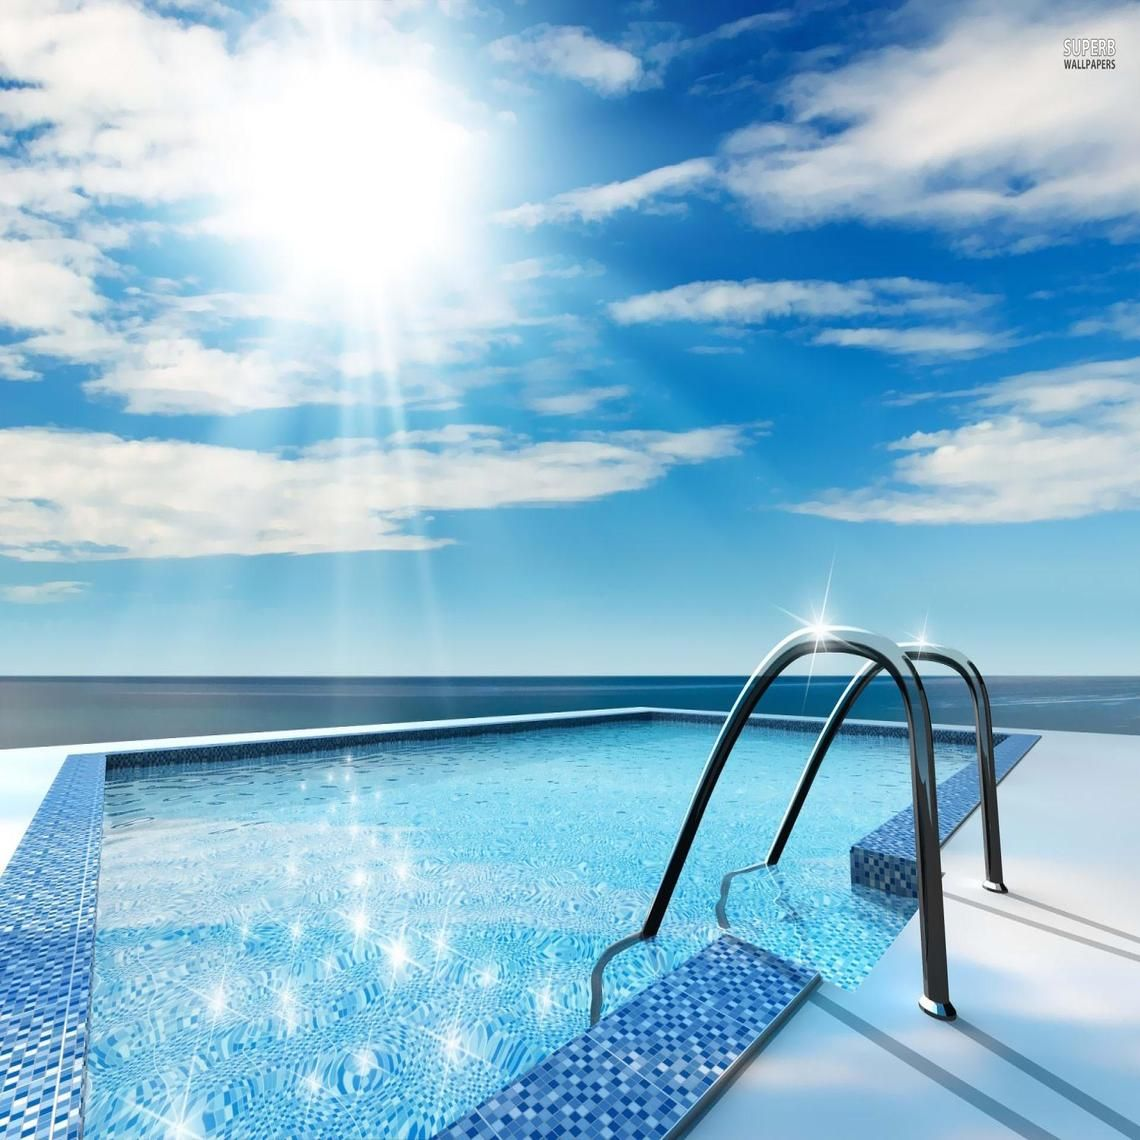 Swimming Pool Wallpaper With Scenic Swimming Pool Wallpaper Pinterest